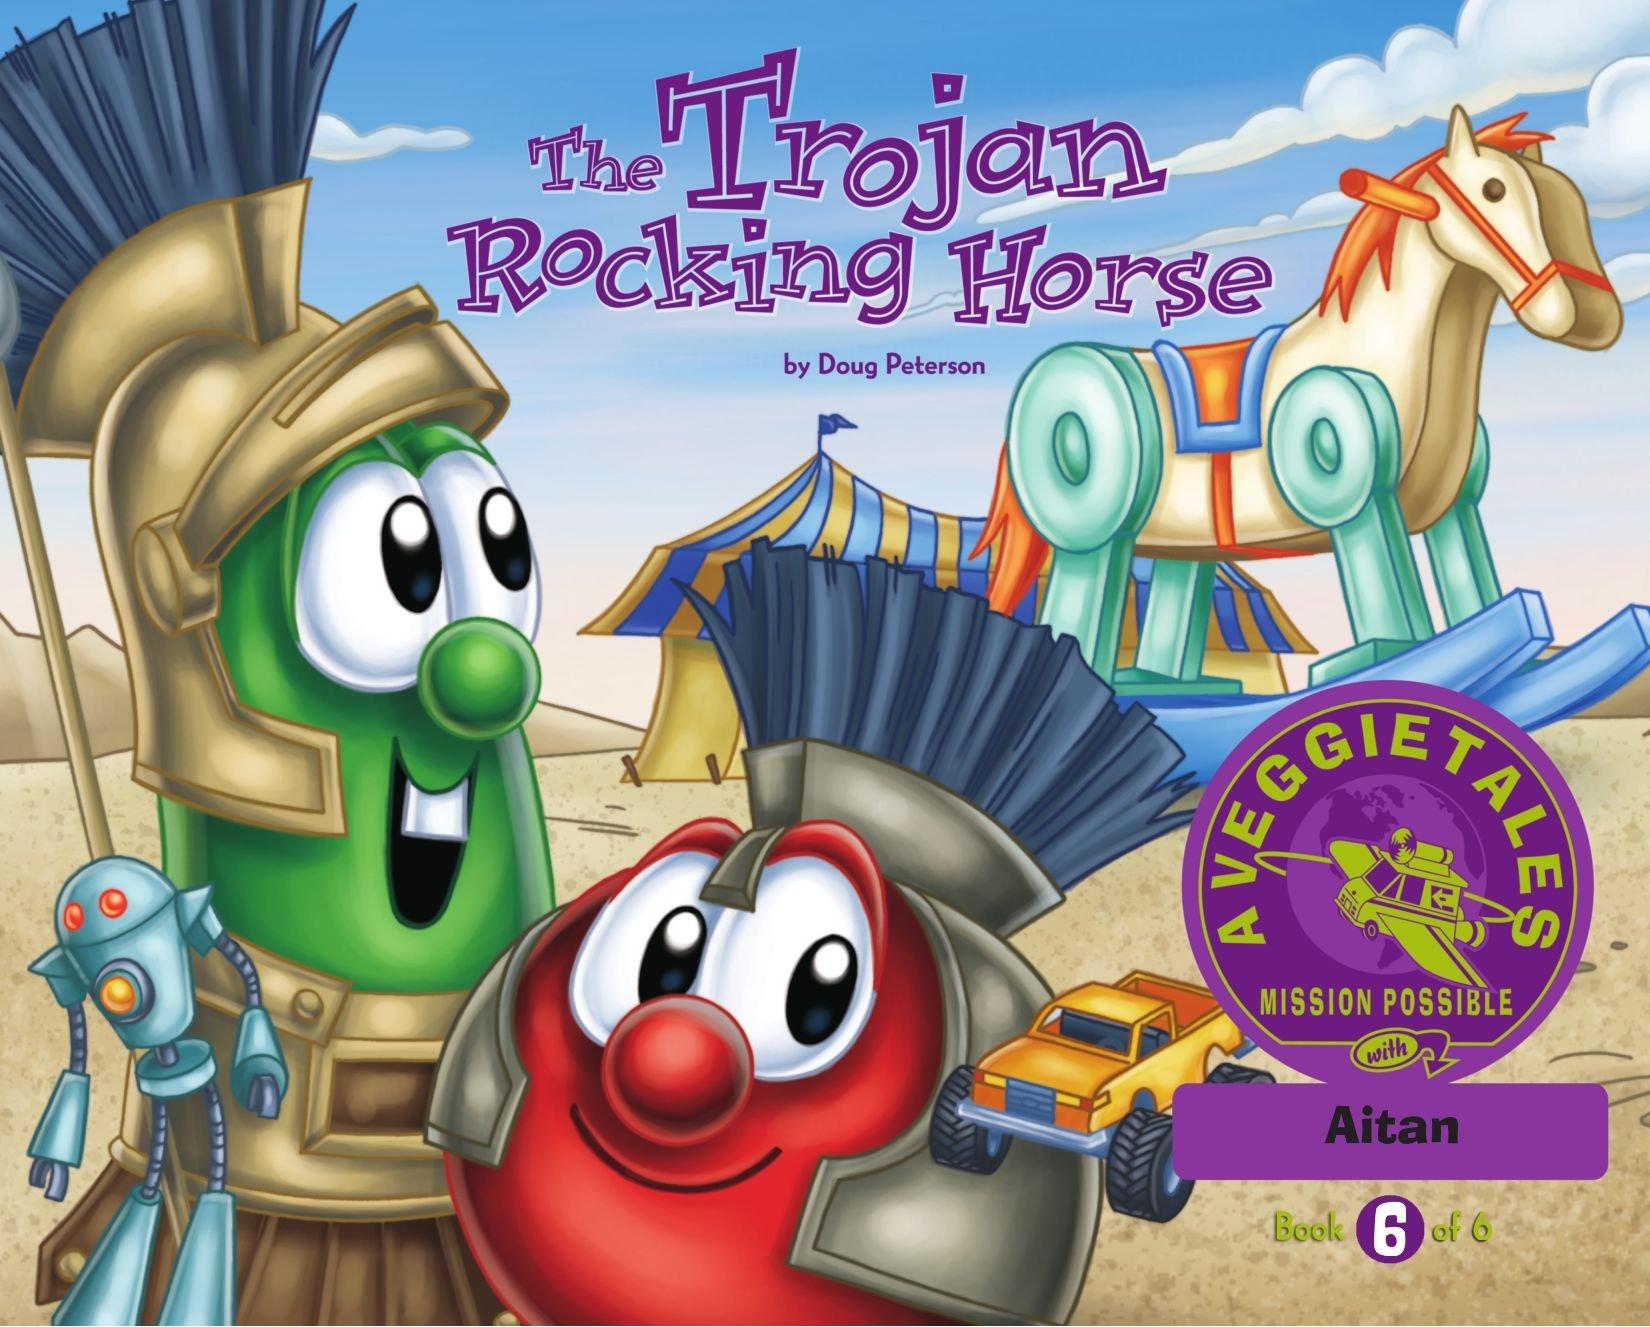 The Trojan Rocking Horse - VeggieTales Mission Possible Adventure Series #6: Personalized for Aitan (Girl) PDF